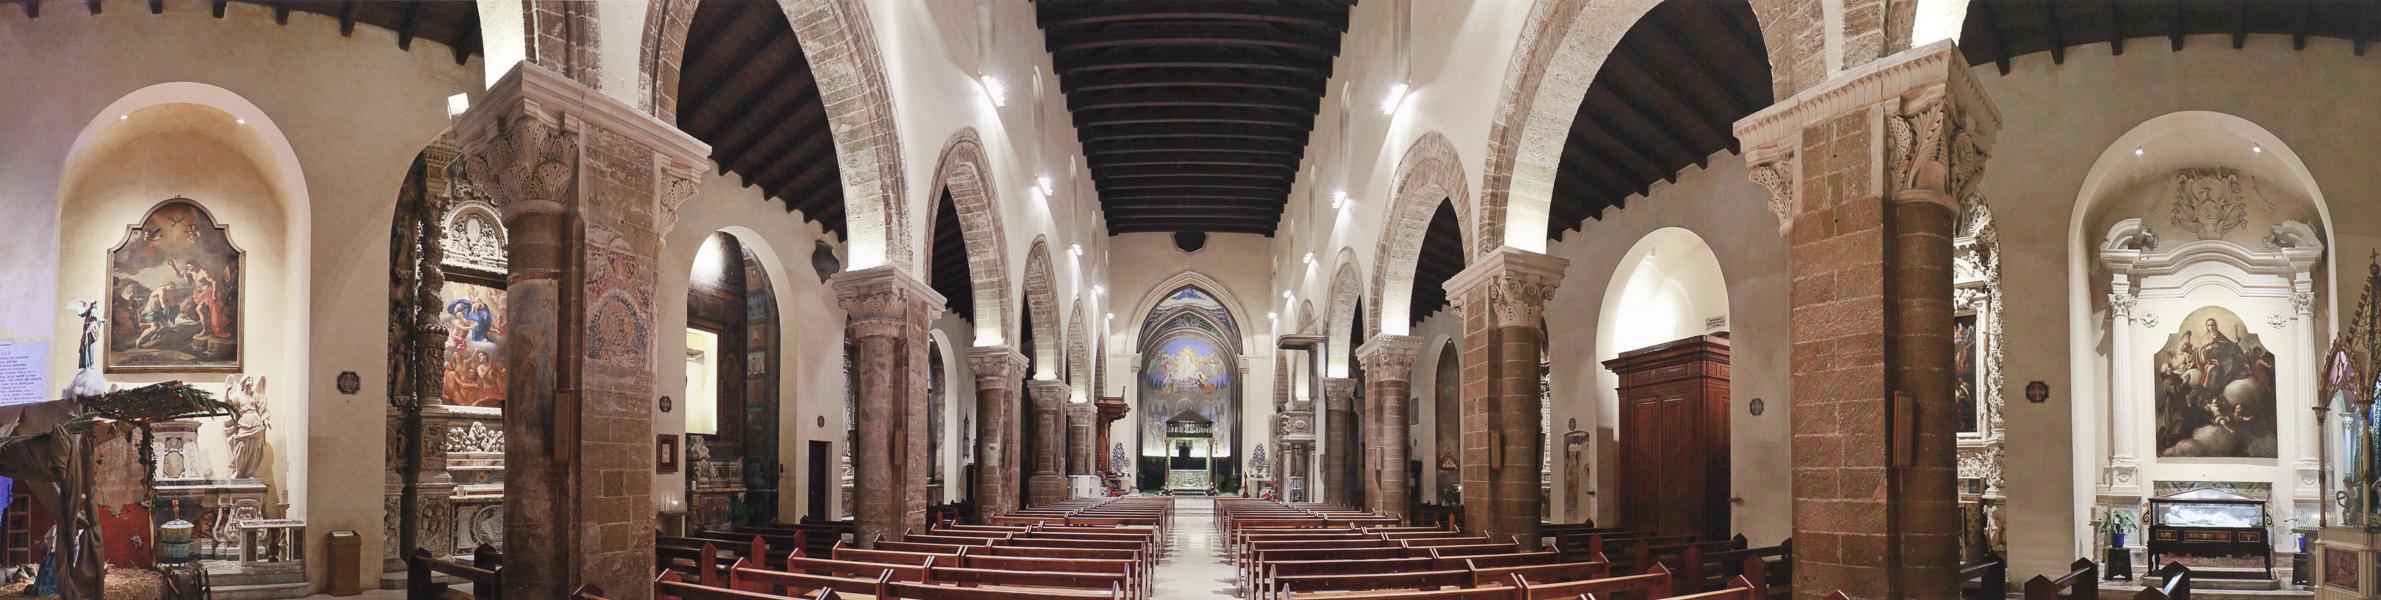 Panoramica interna, cattedrale di Nardò. Foto Aristide Mazzarella